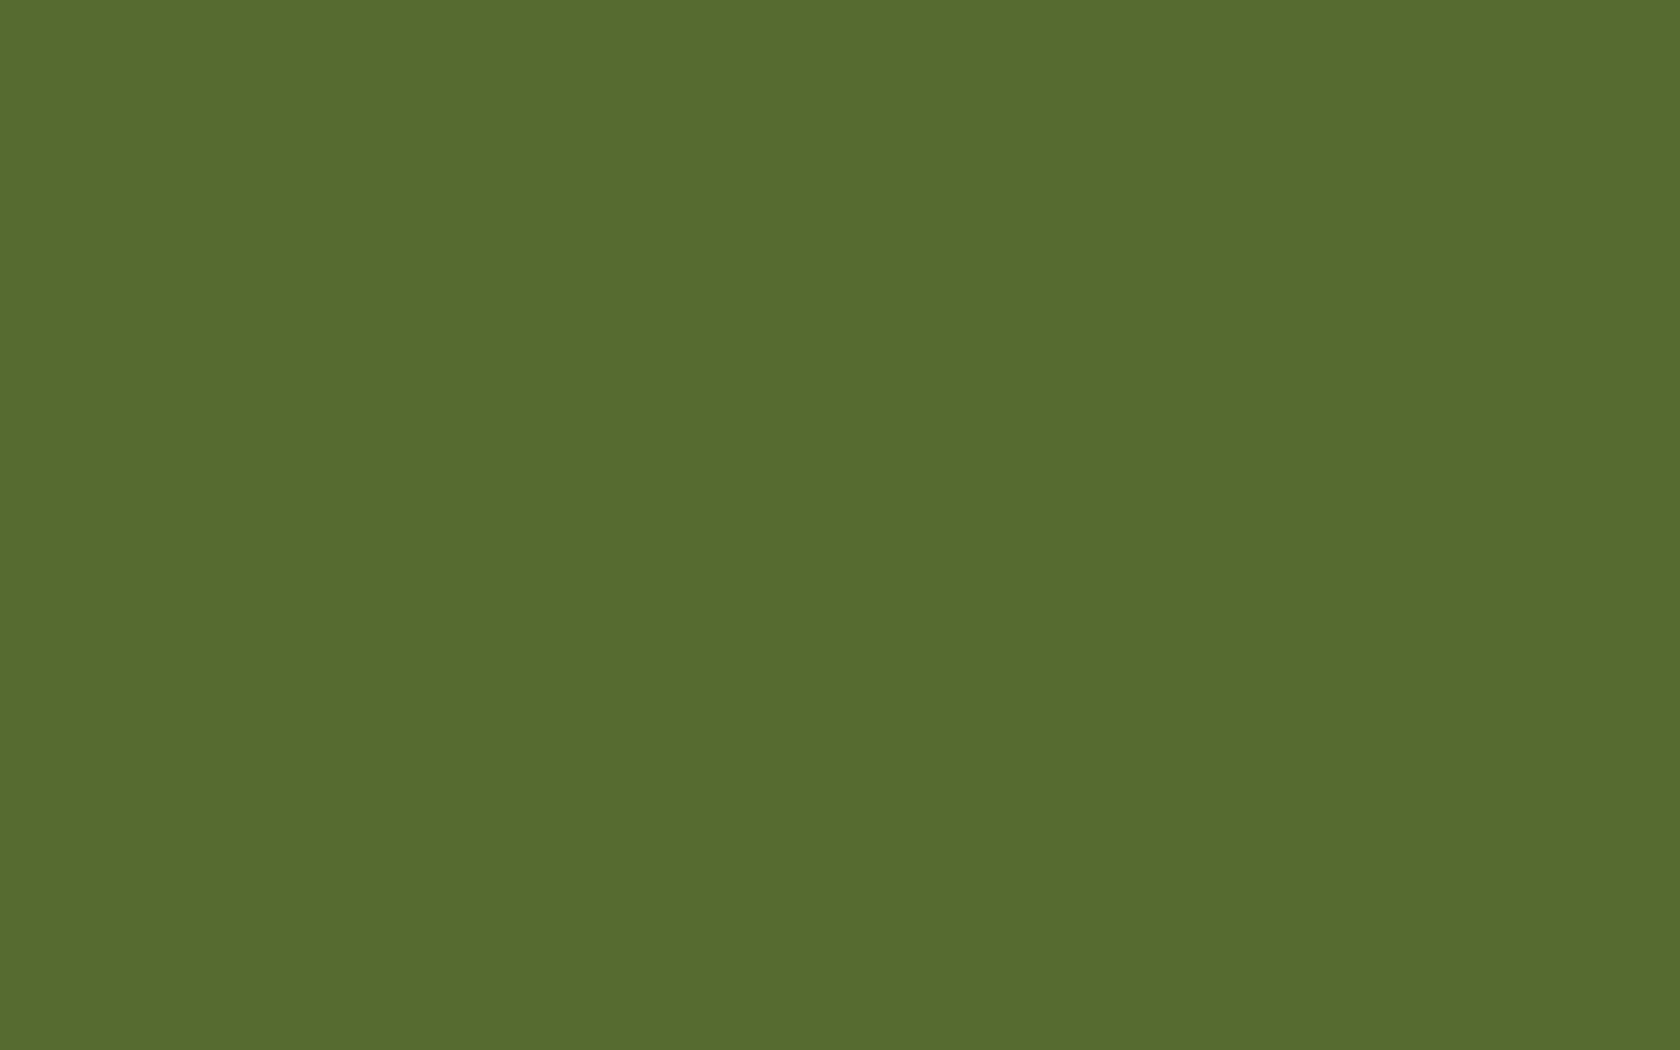 1680x1050 Dark Olive Green Solid Color Background